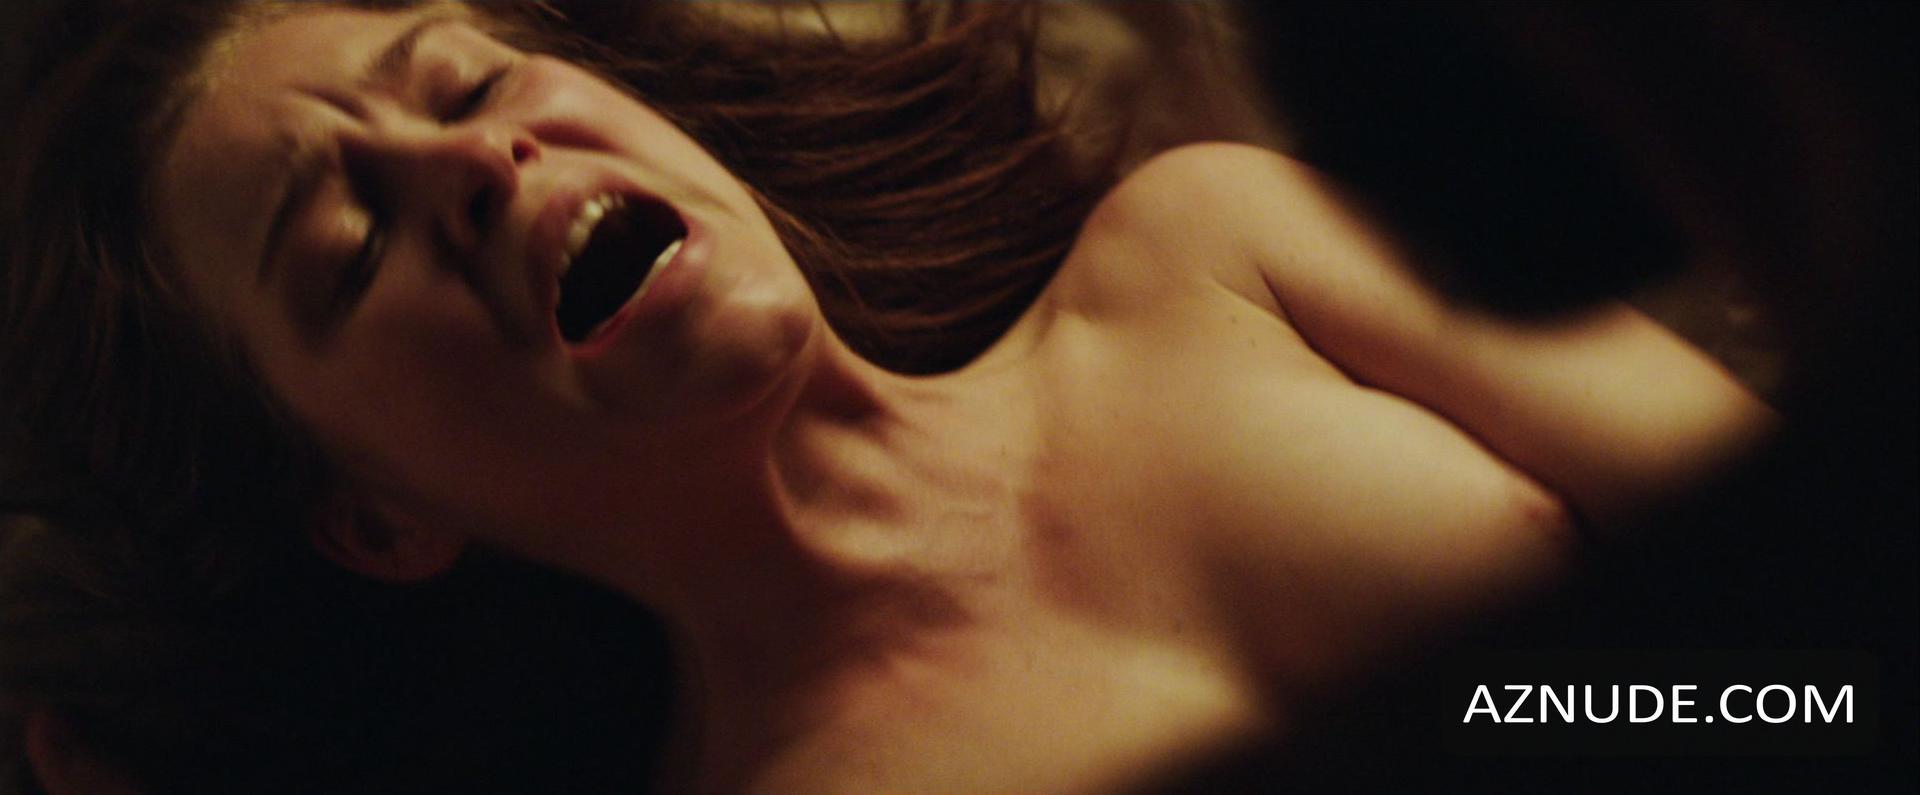 The Crucifixion Nude Scenes - Aznude-9250